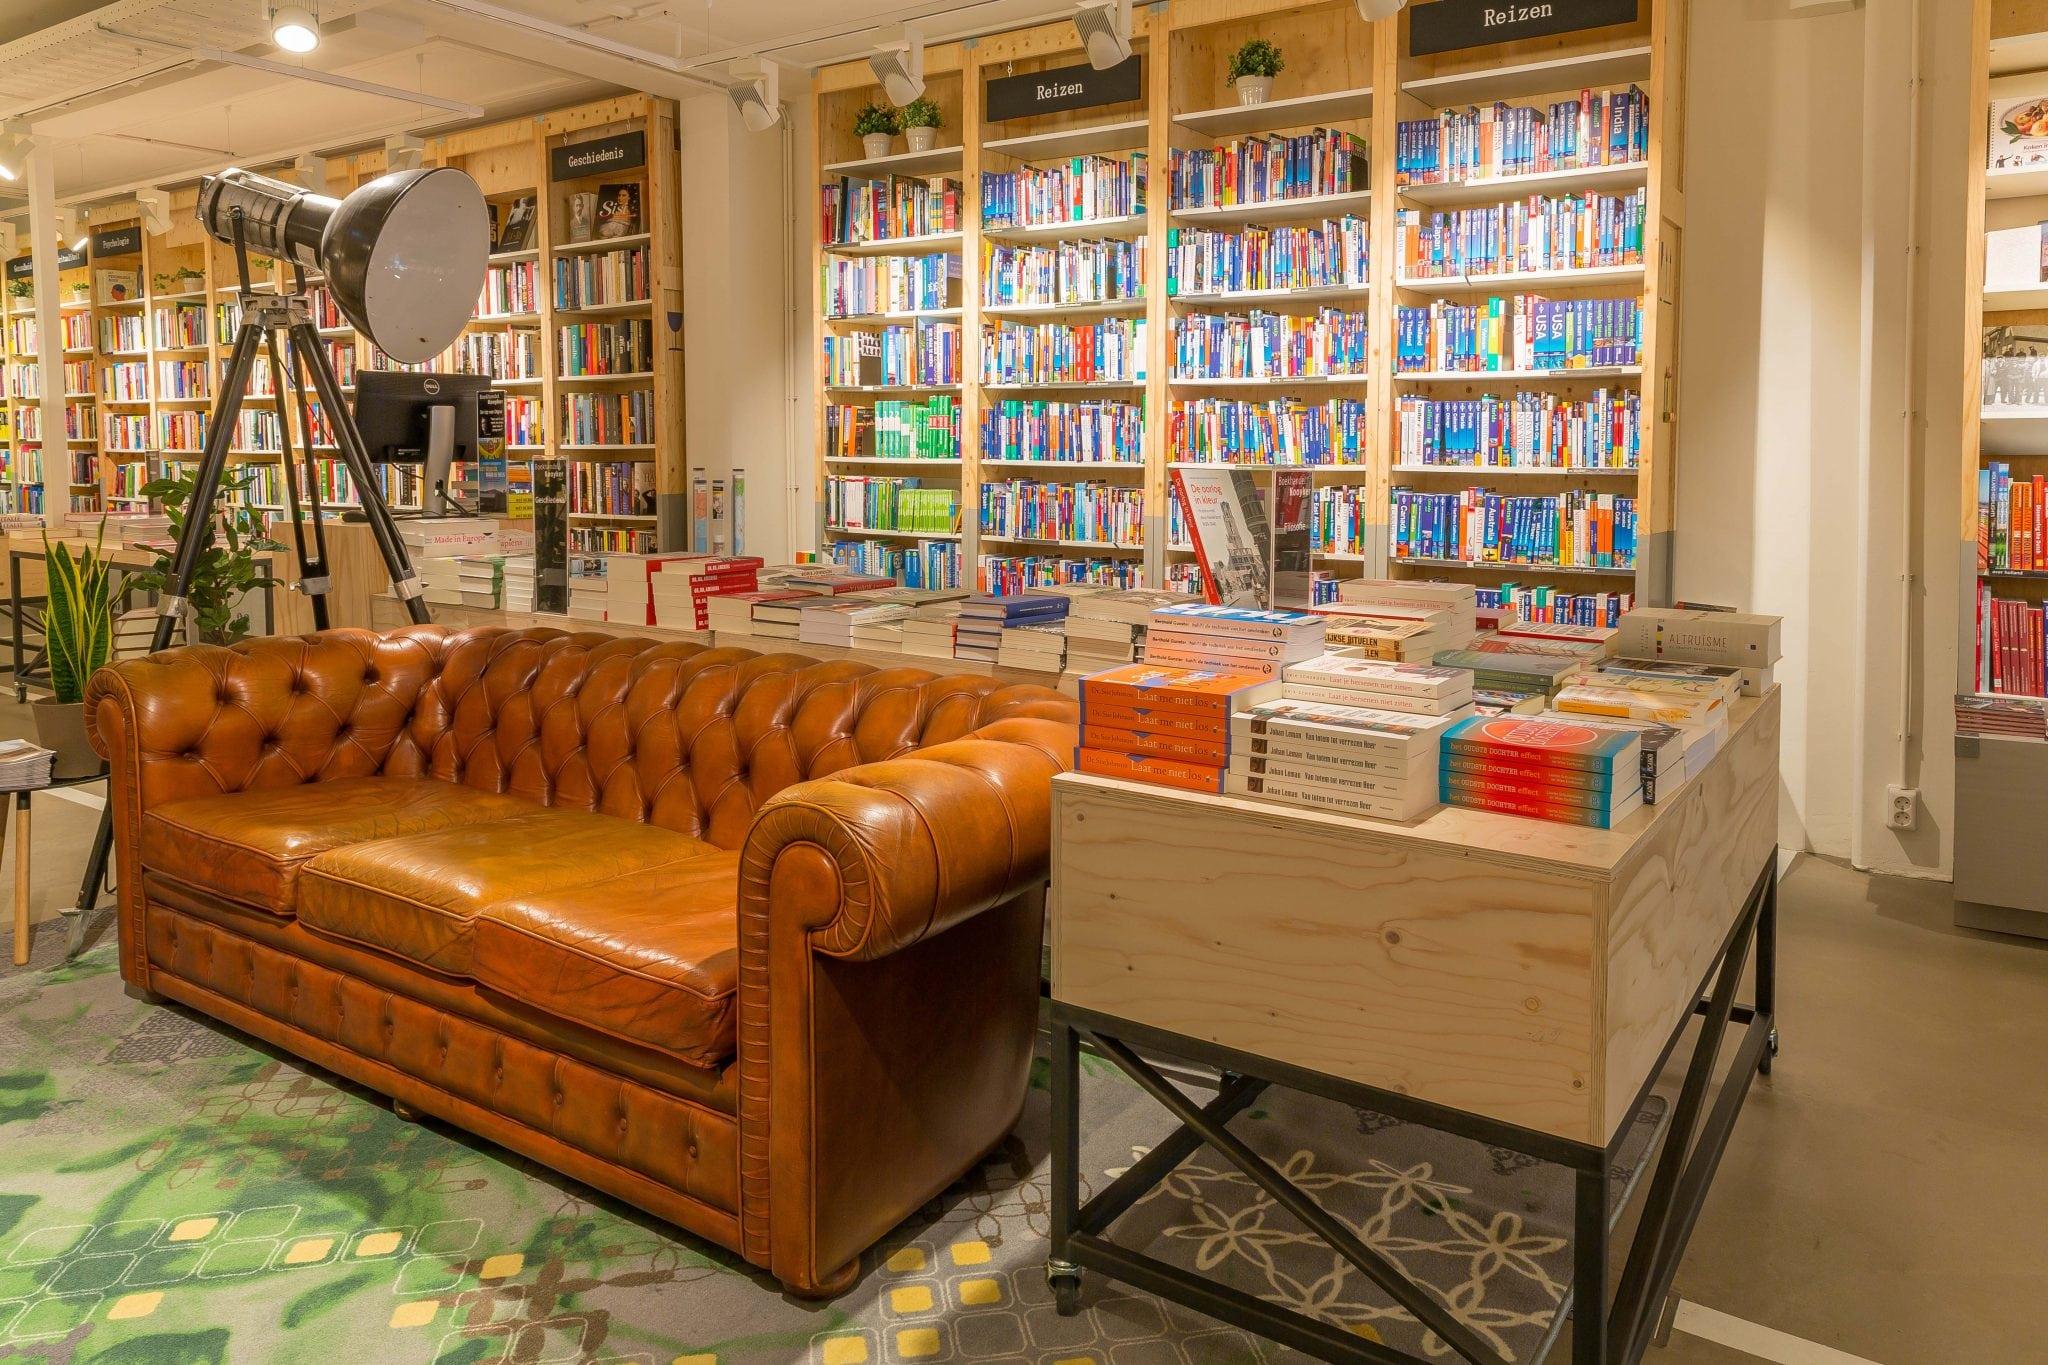 Hiddemafotografie-boekhandel kooyker (23)